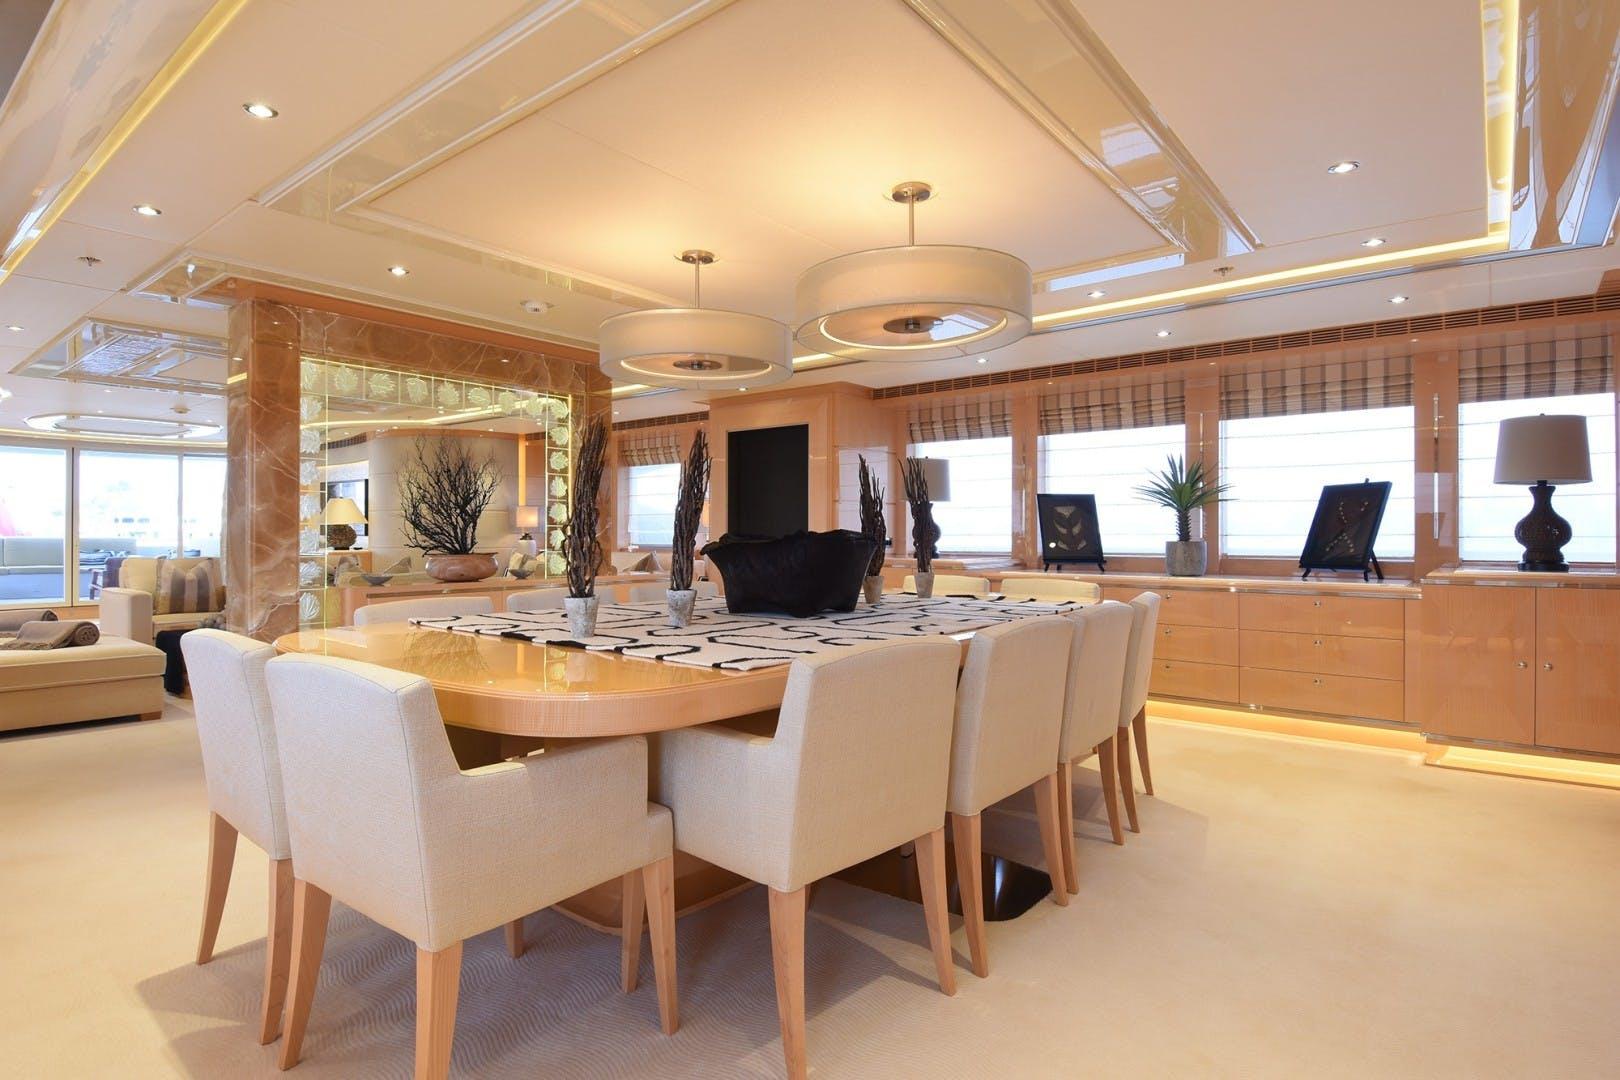 2011 Heesen Yachts 180' Lloyds, LY2/MCA Abbracci | Picture 5 of 11